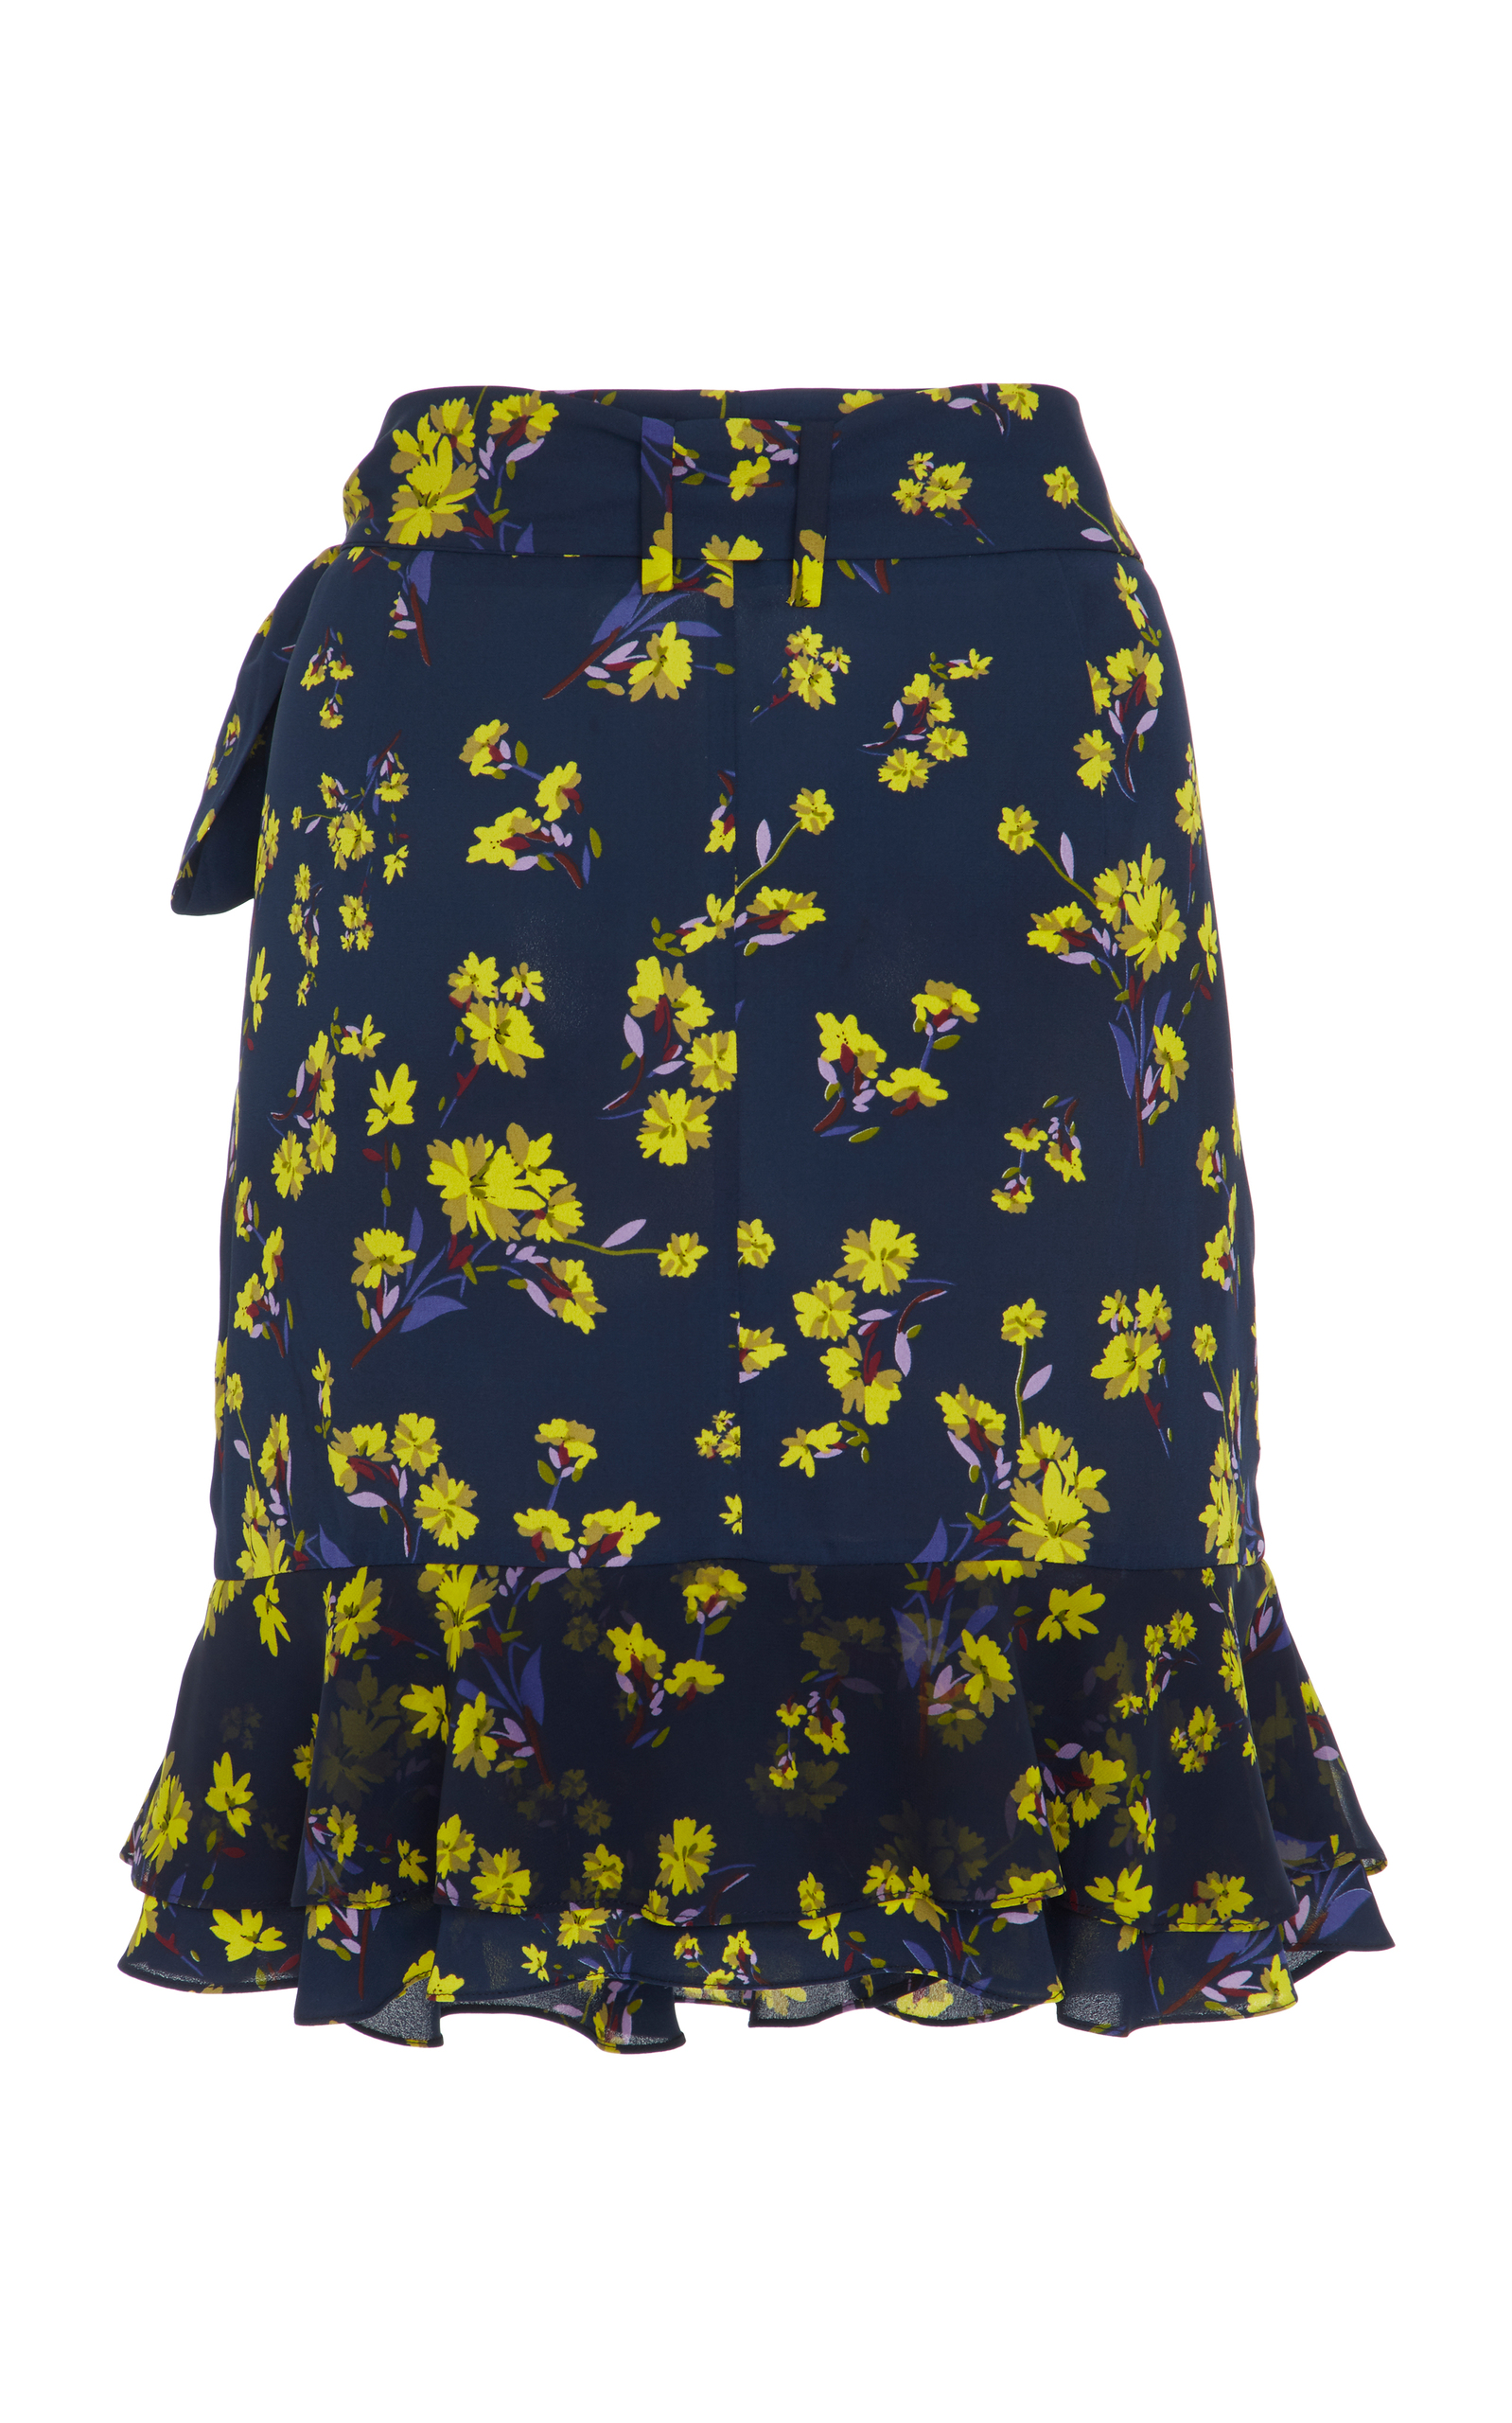 838ffd171d JFloral Printed Ruffled Wrap Mini Skirt. CLOSE. Loading. Loading